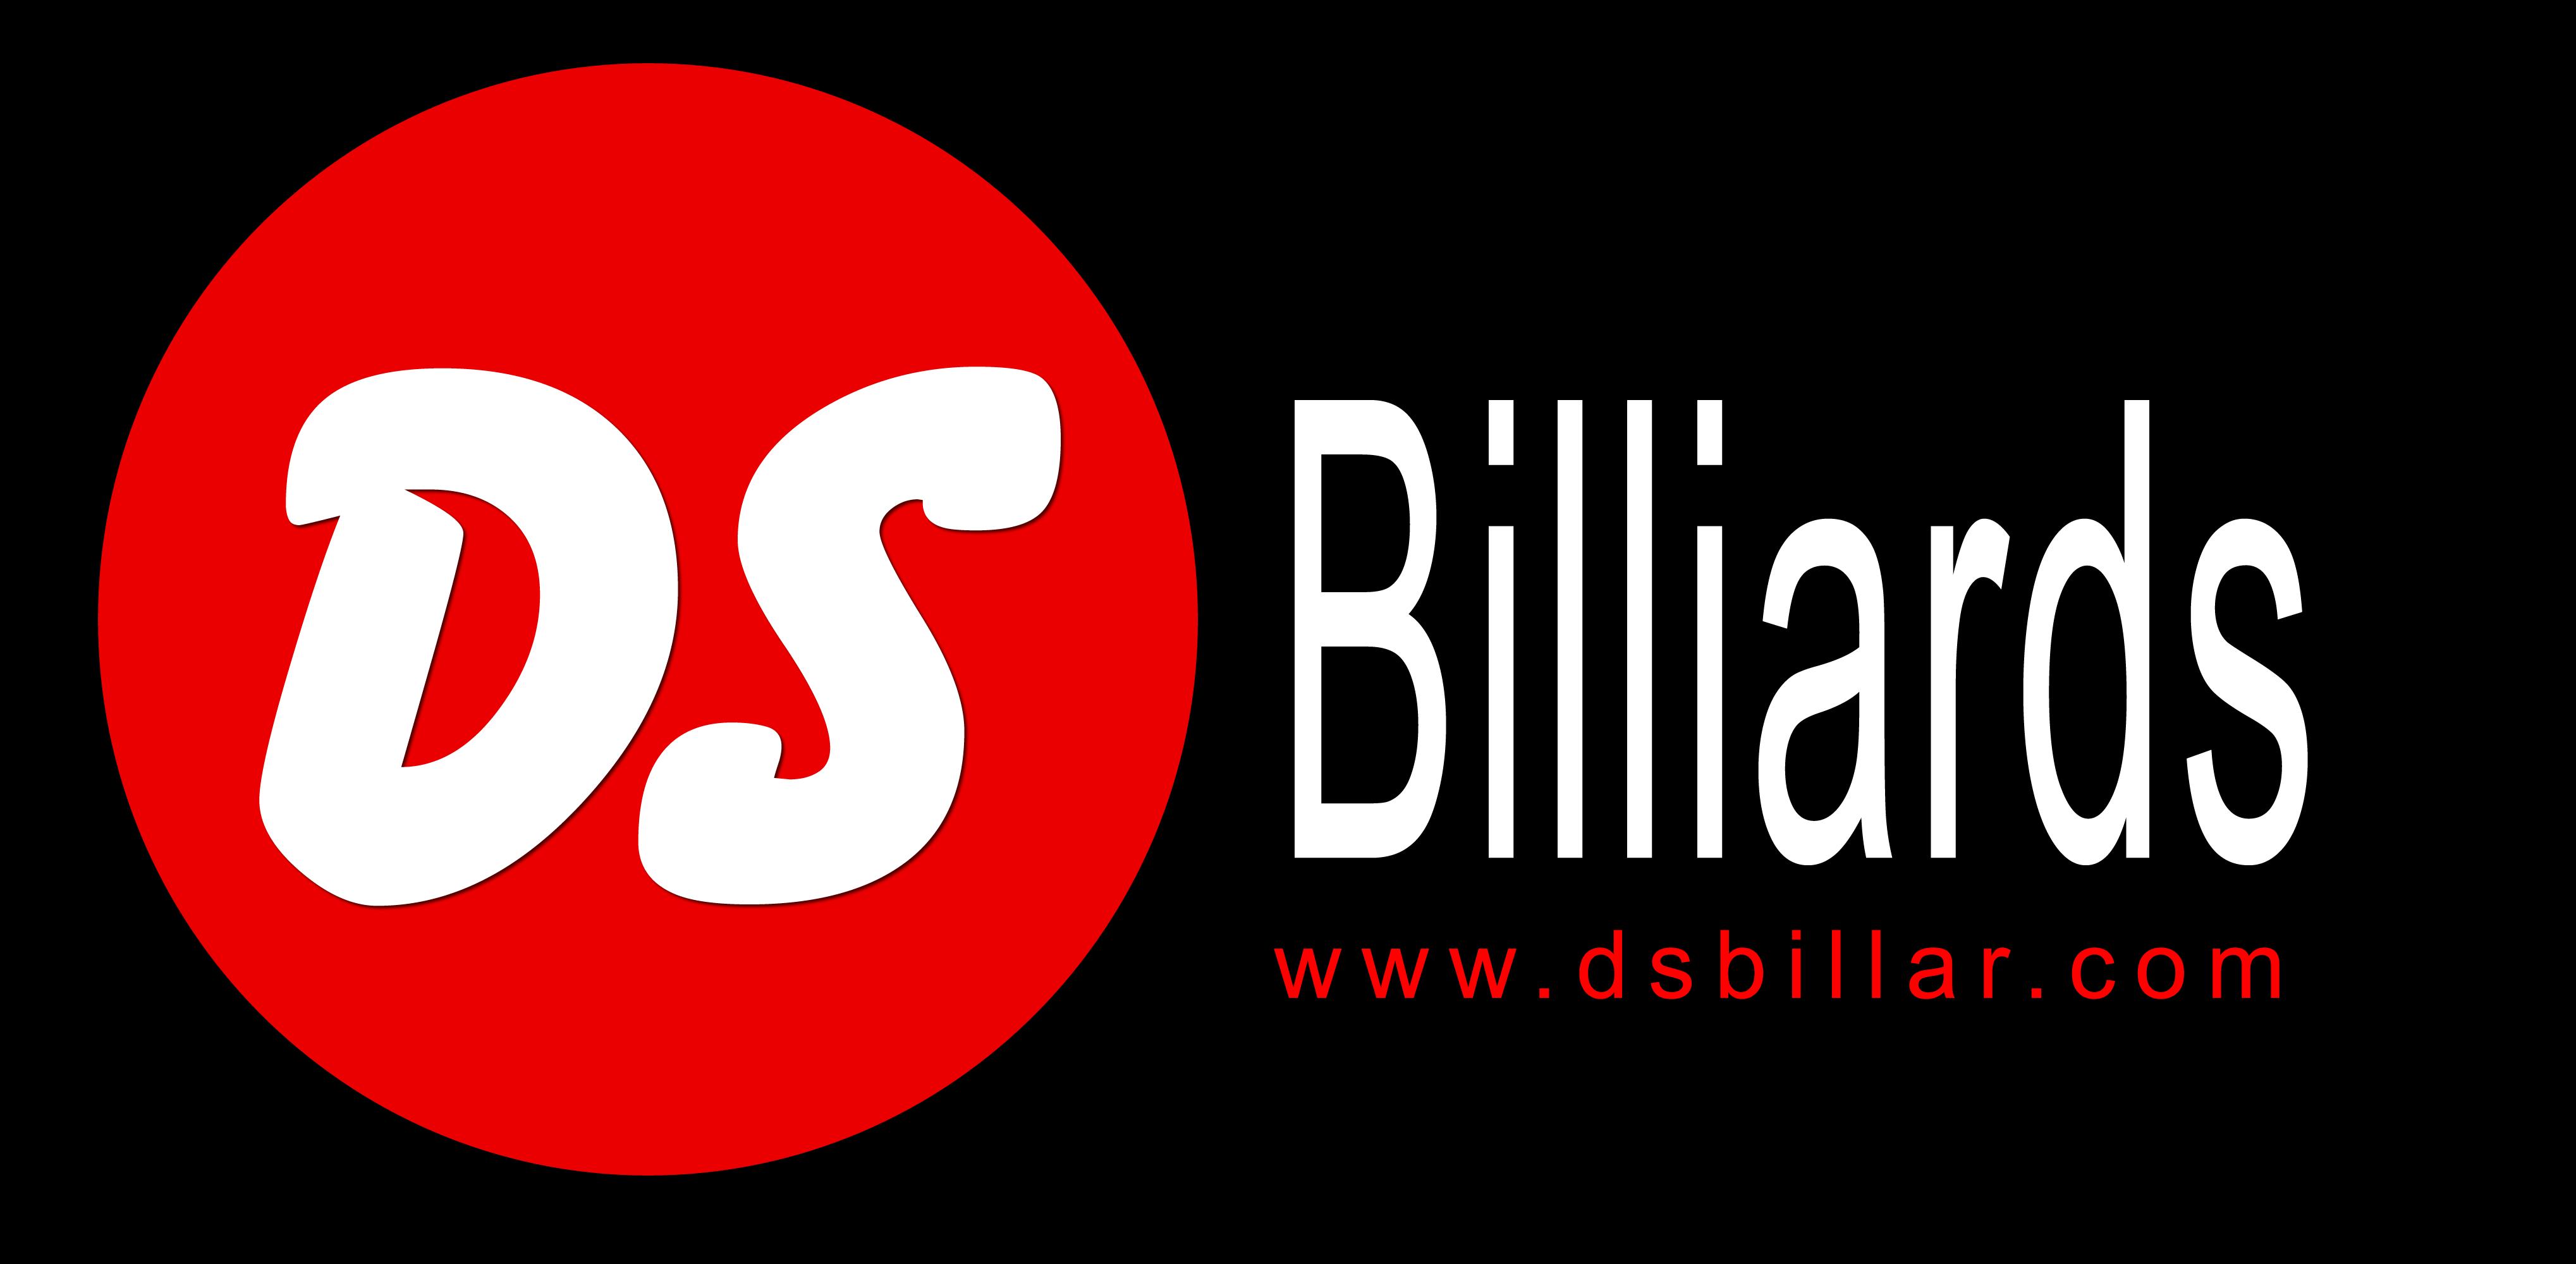 DS BILLIARDS